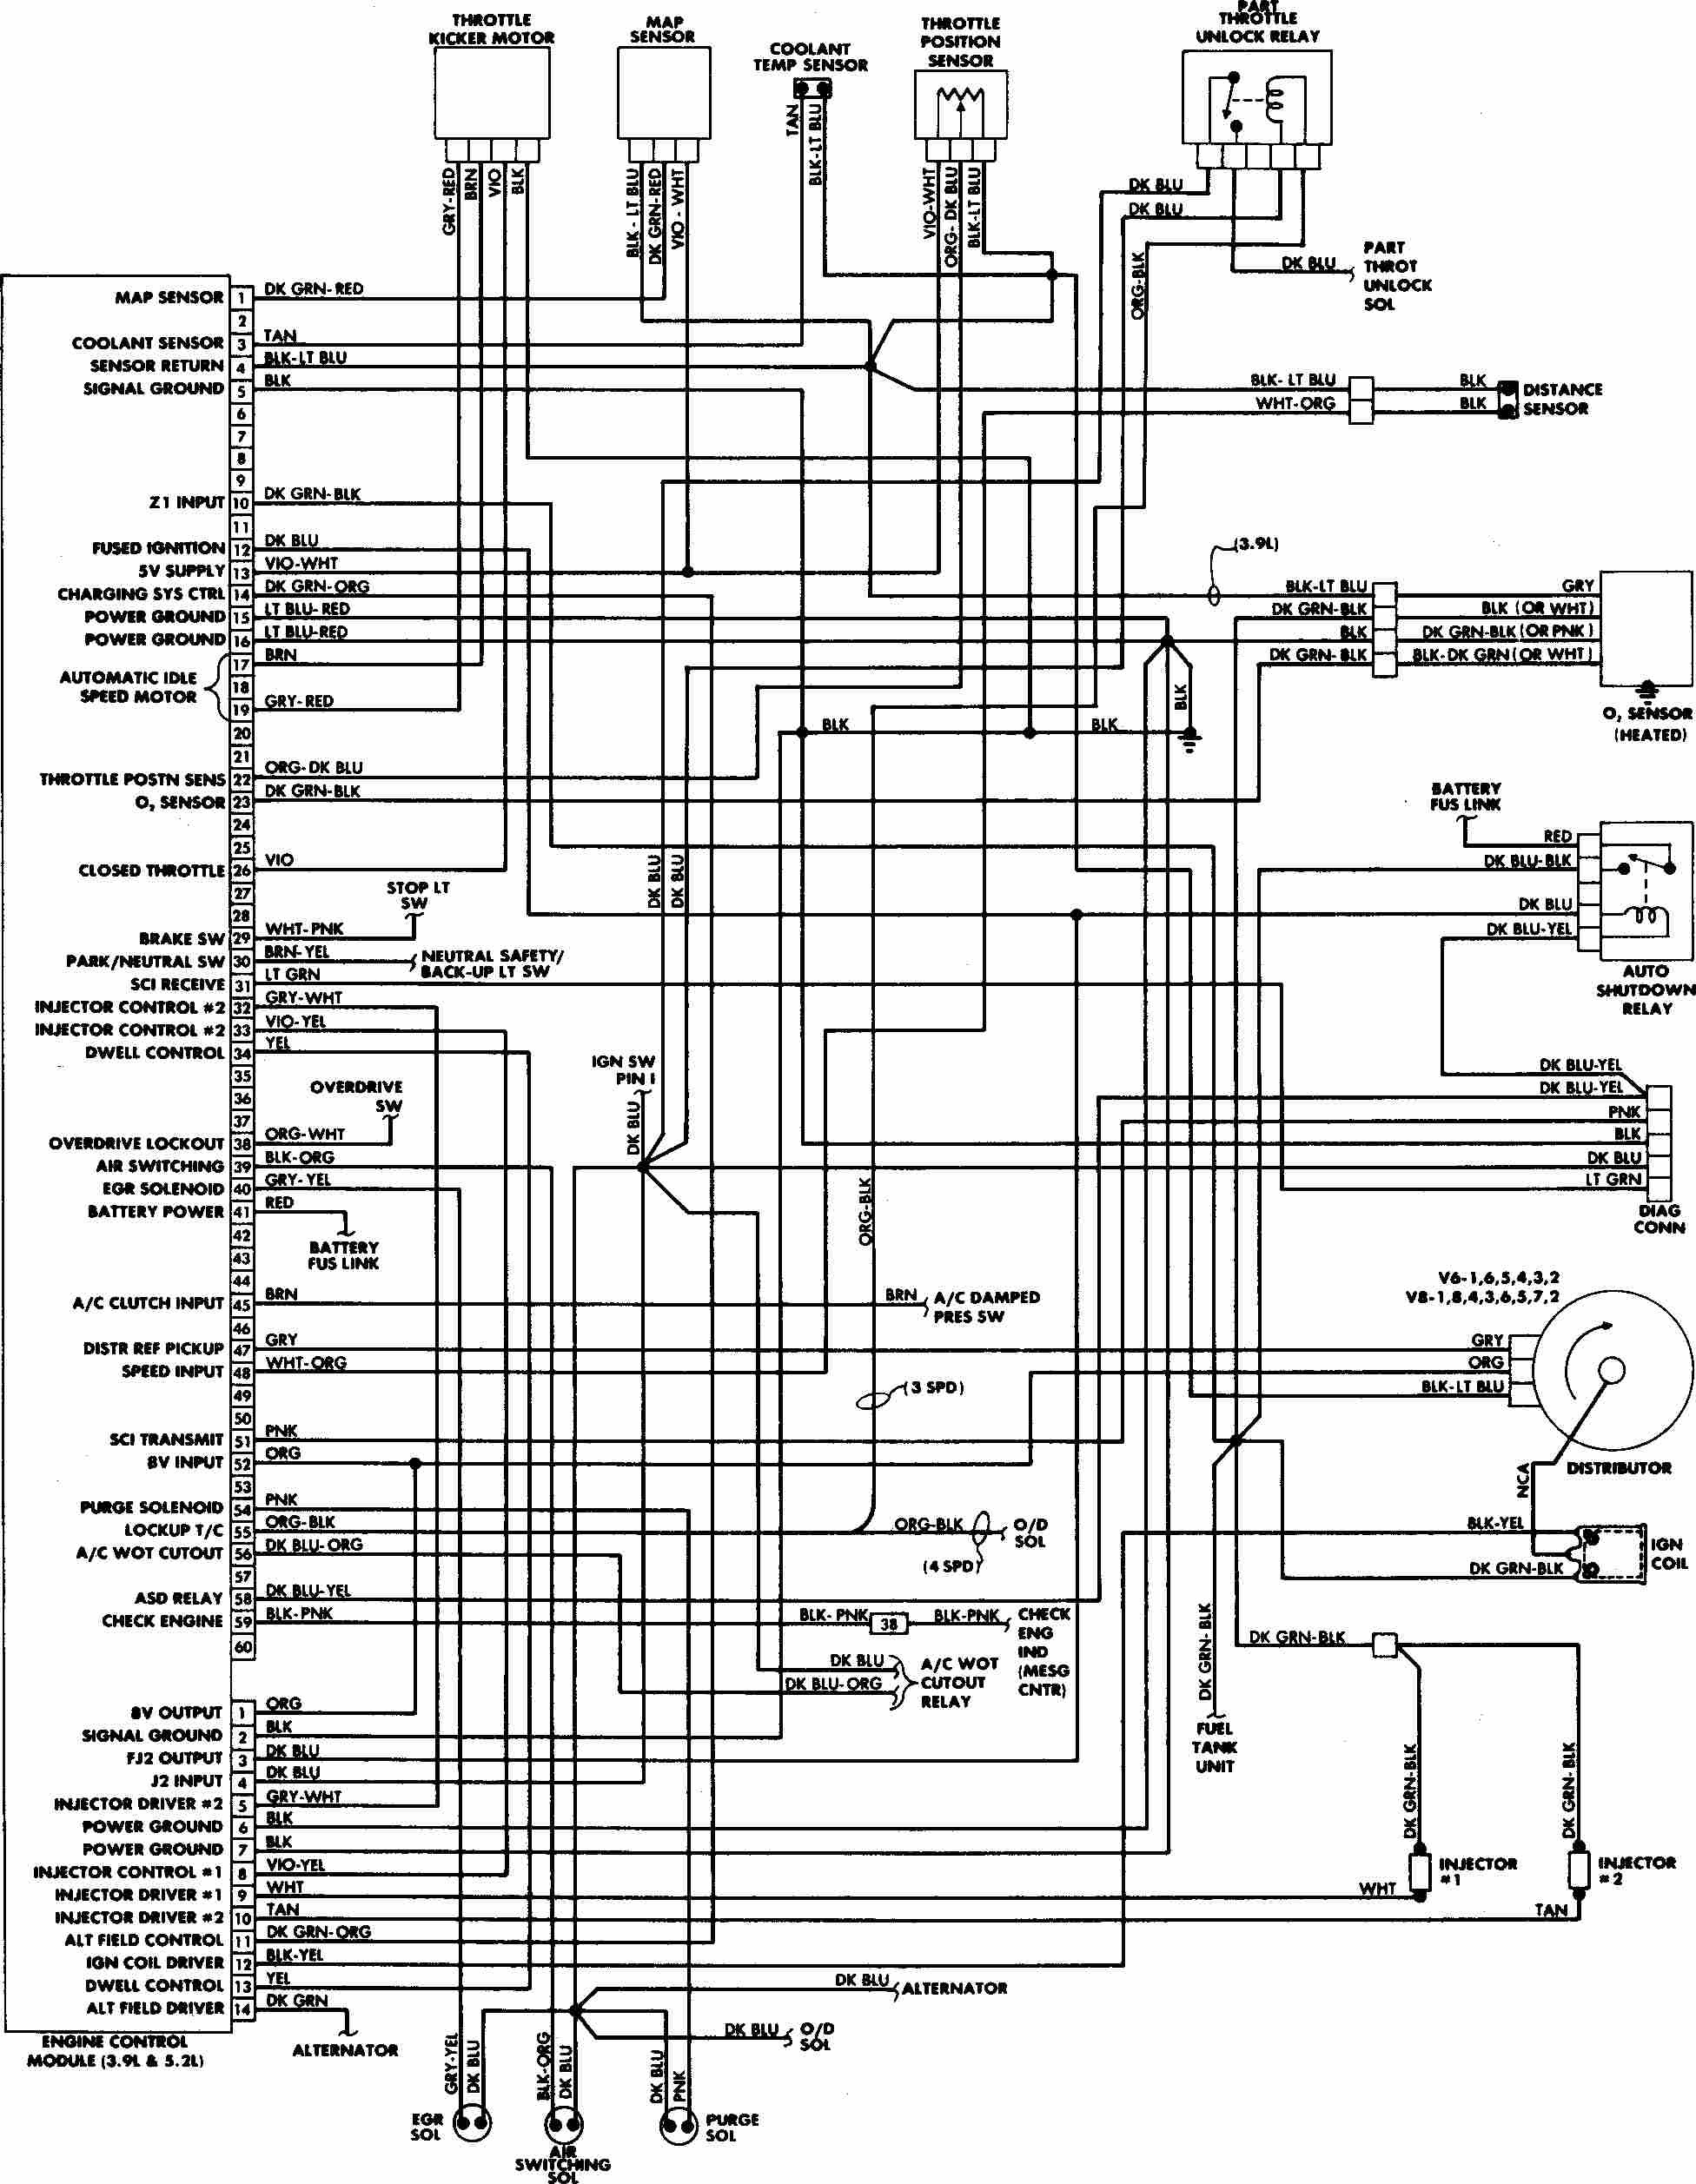 Dodge Dakota Tail Light Wiring Diagram 2003 Dodge Durango Emissions Diagram Free Download Wiring Diagram Of Dodge Dakota Tail Light Wiring Diagram 1998 Dodge Dakota Overdrive Switch Wiring Along with 2001 Dodge Ram